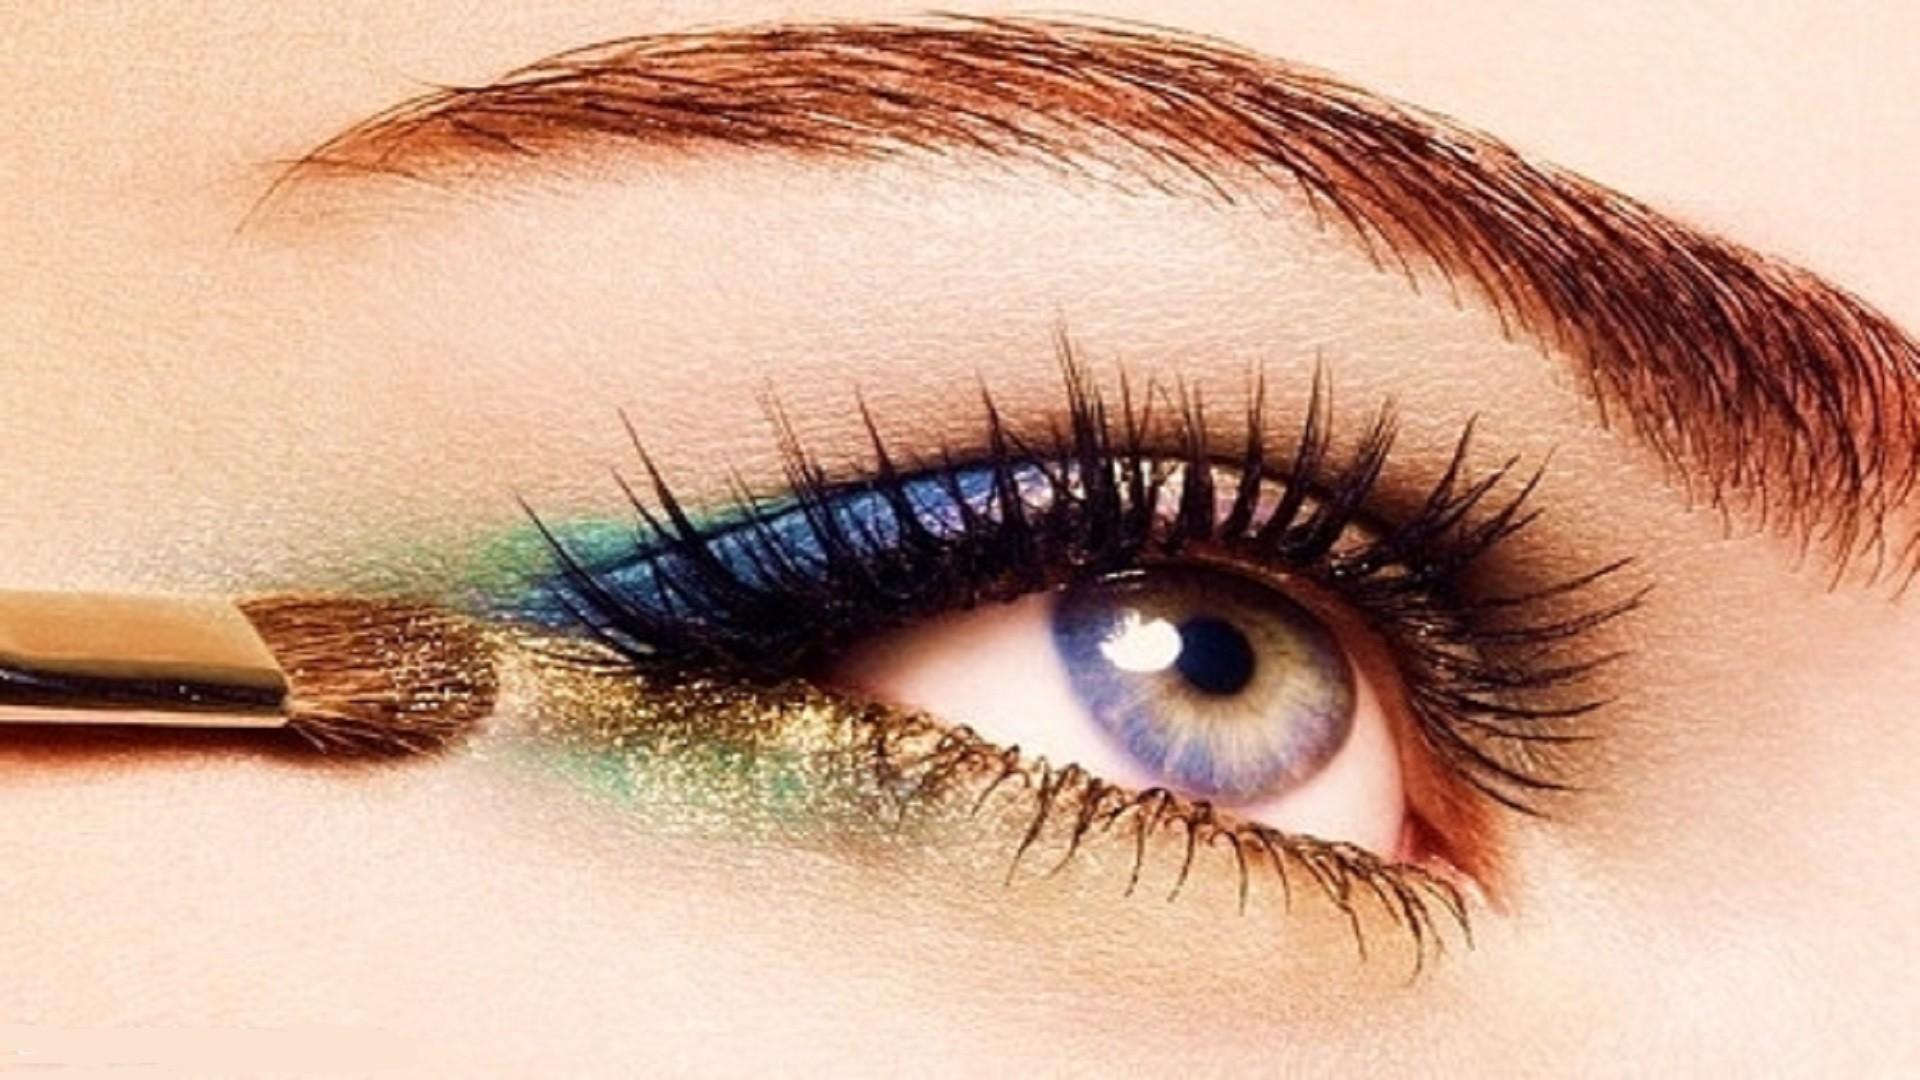 26464 Beautiful Eye Makeup Hd Free Wallpapers Data Src Make Up Full Hd 1920x1080 Download Hd Wallpaper Wallpapertip